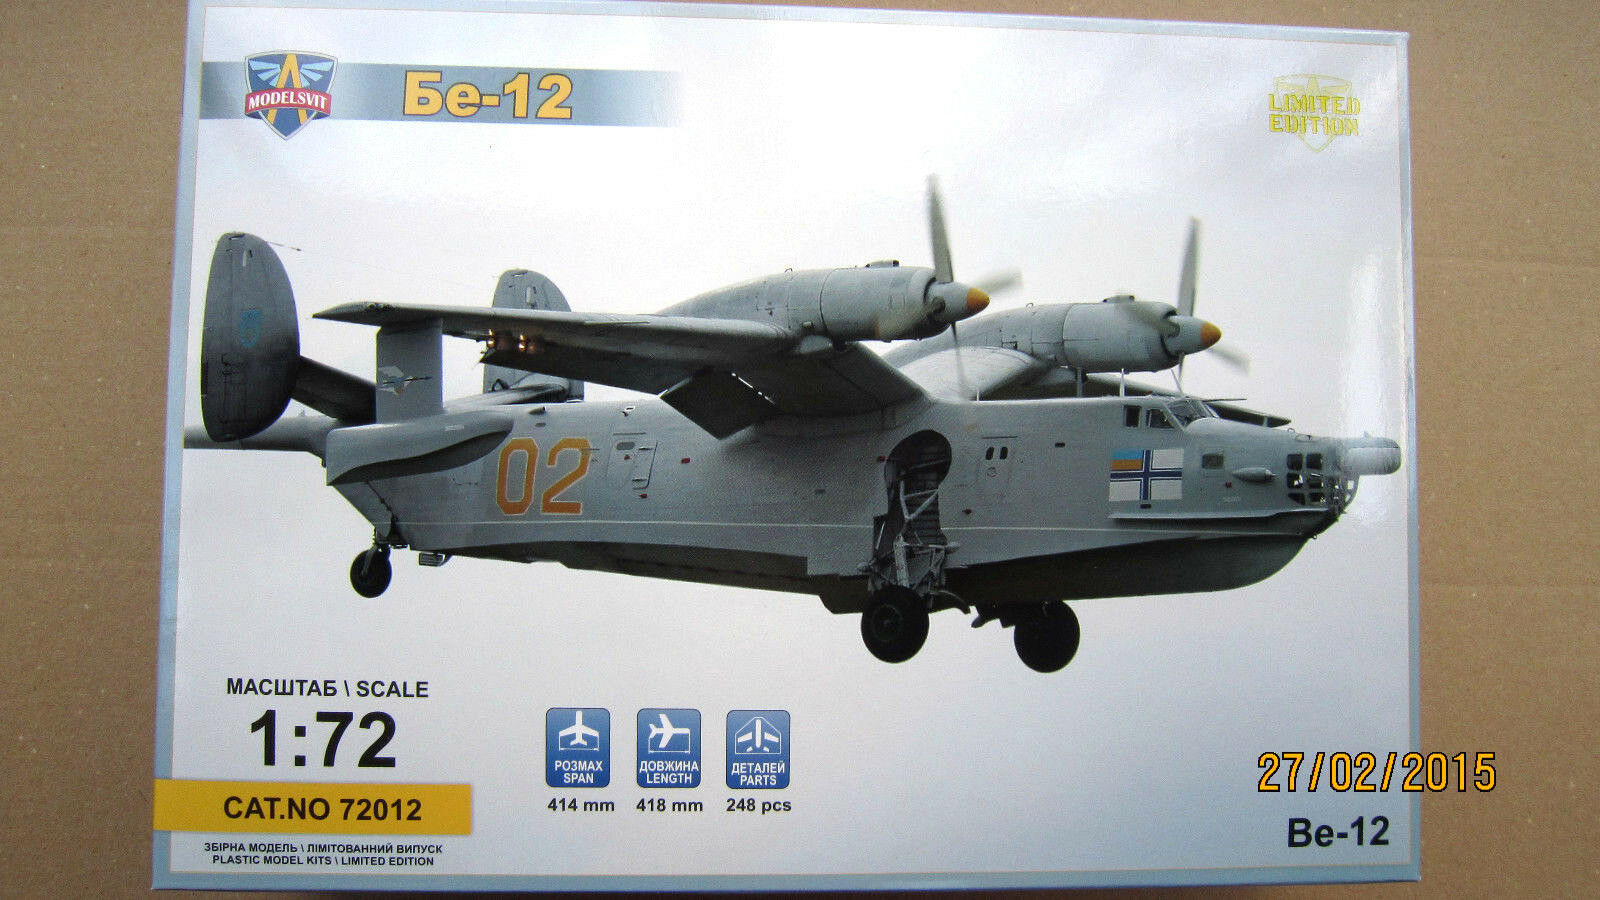 Beriev Be-12 Soviet amphibious aircraft 'Chayka'  1 72 Modelsvit